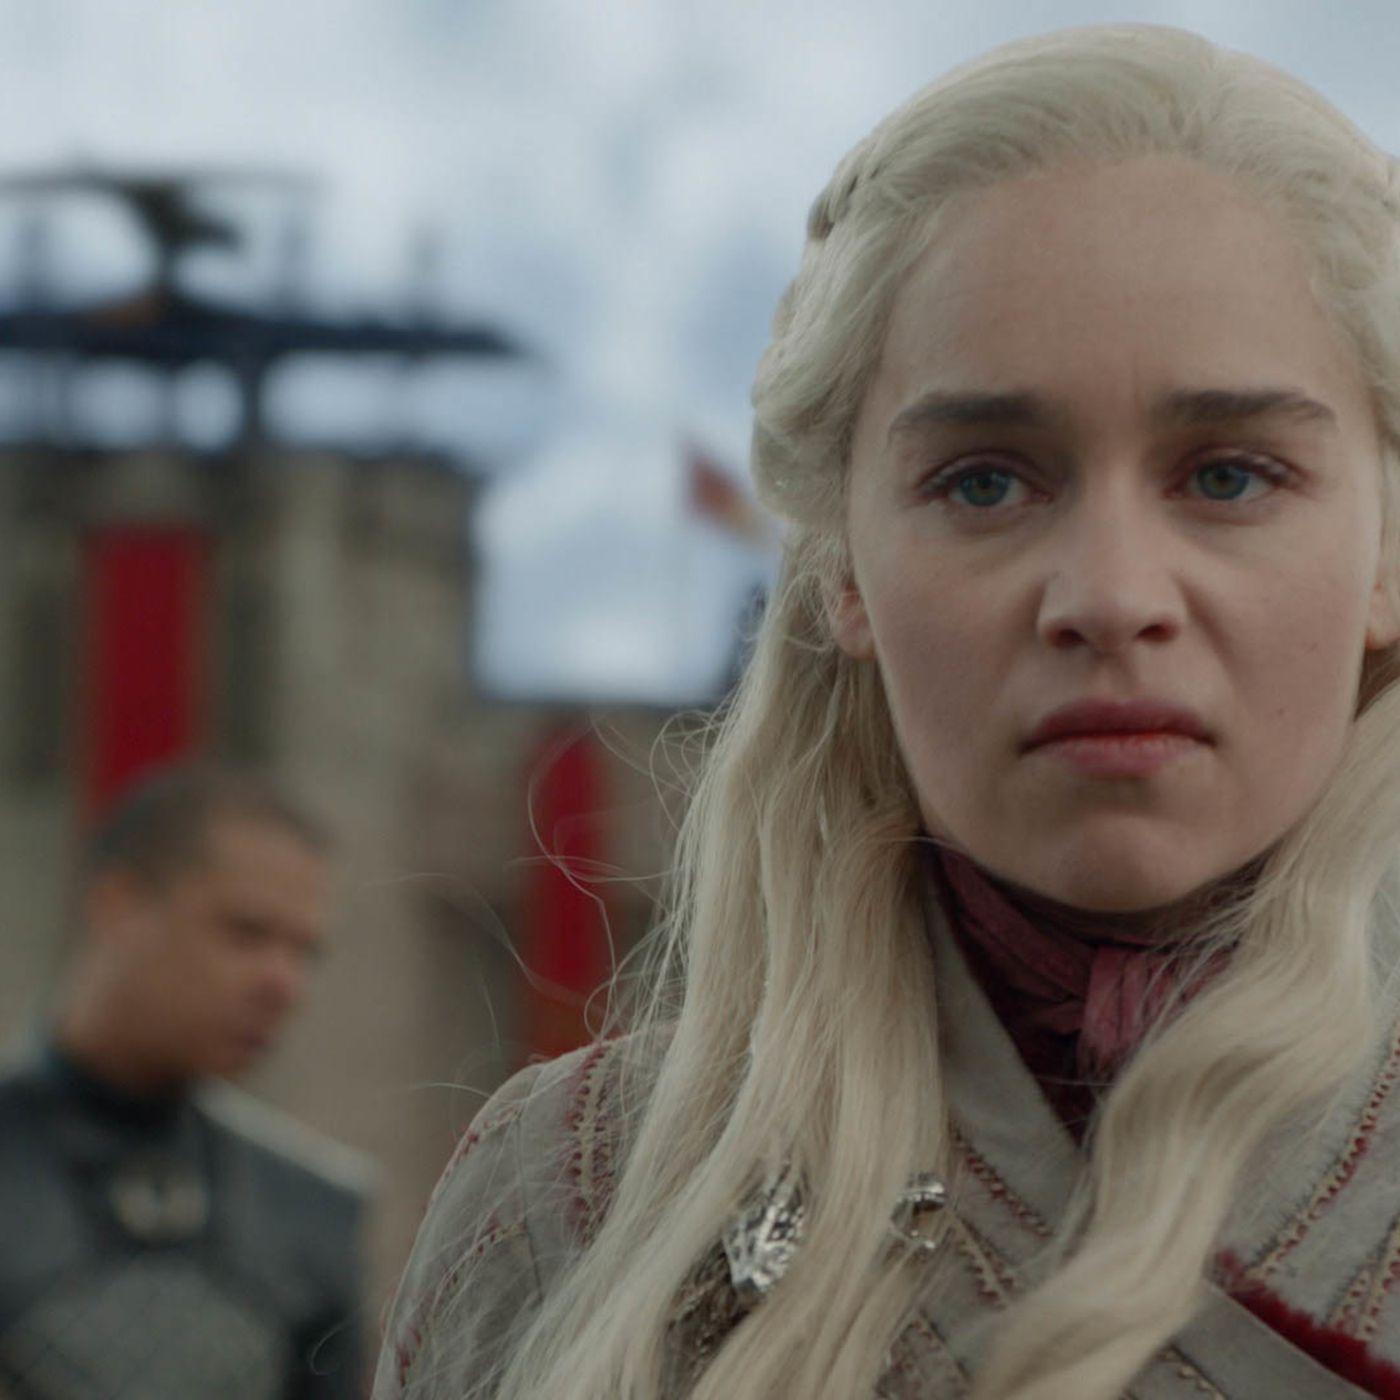 Game of Thrones season 8, episode 5: why Daenerys's dark